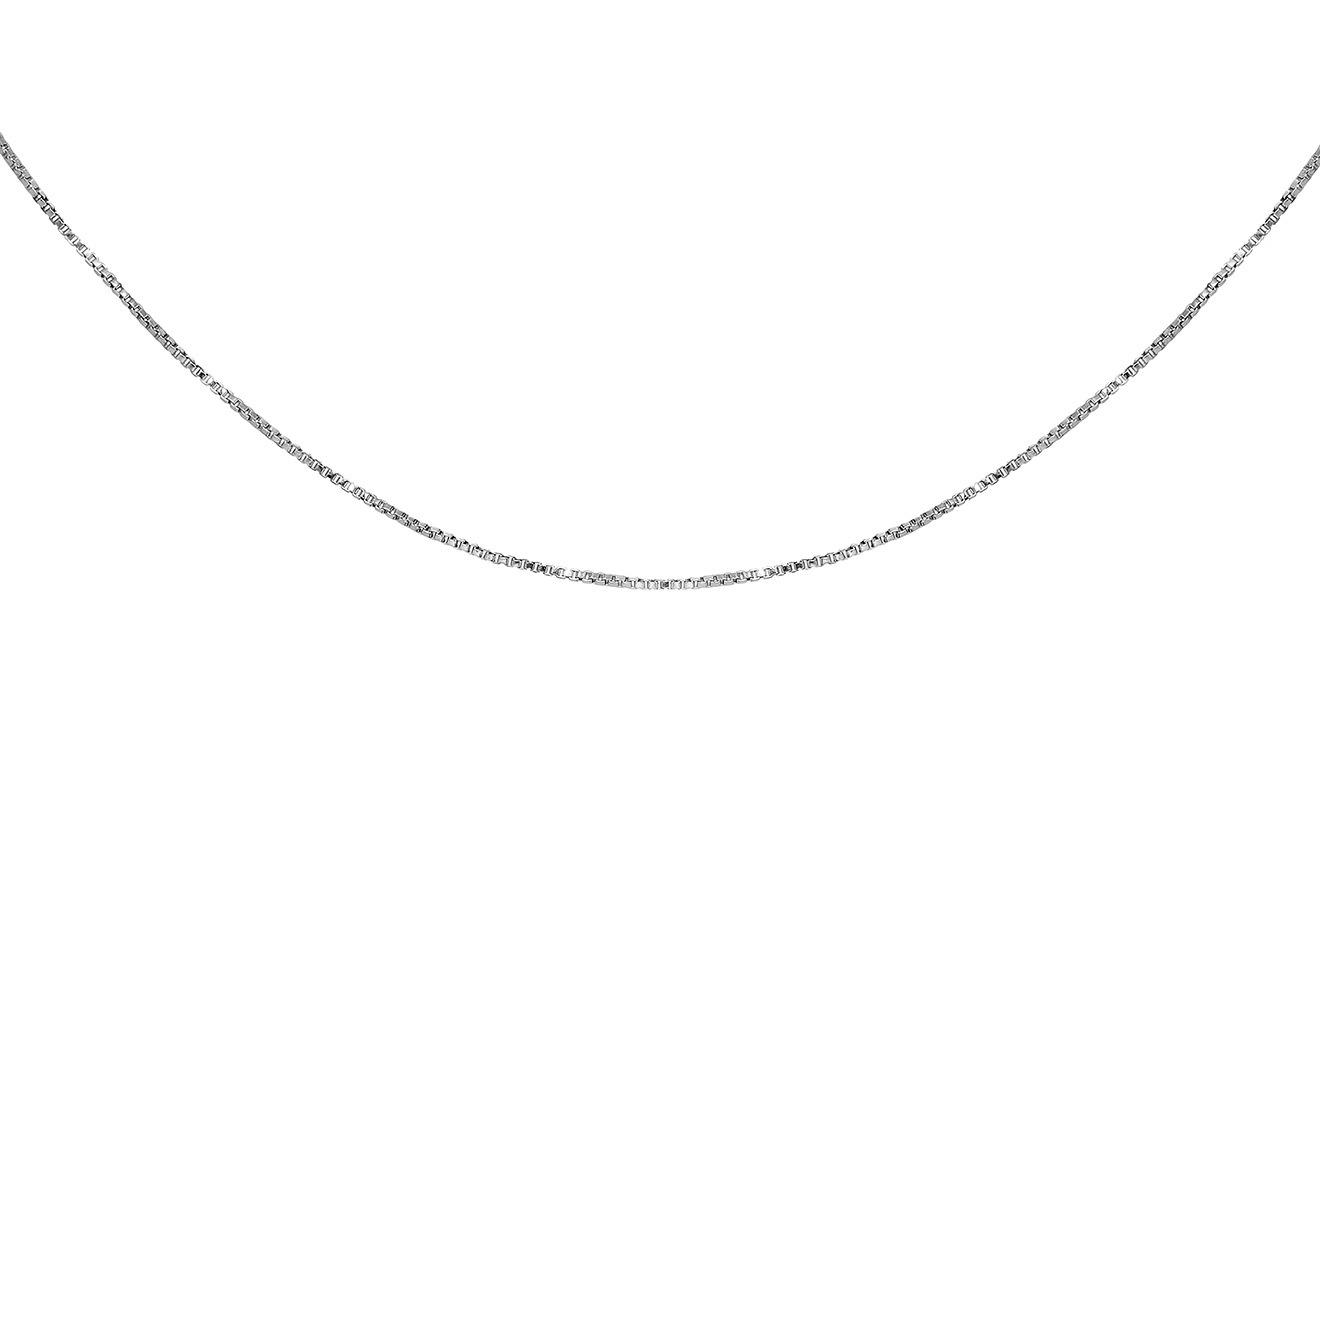 LAVZ Серебряная цепь Adjustable Chain